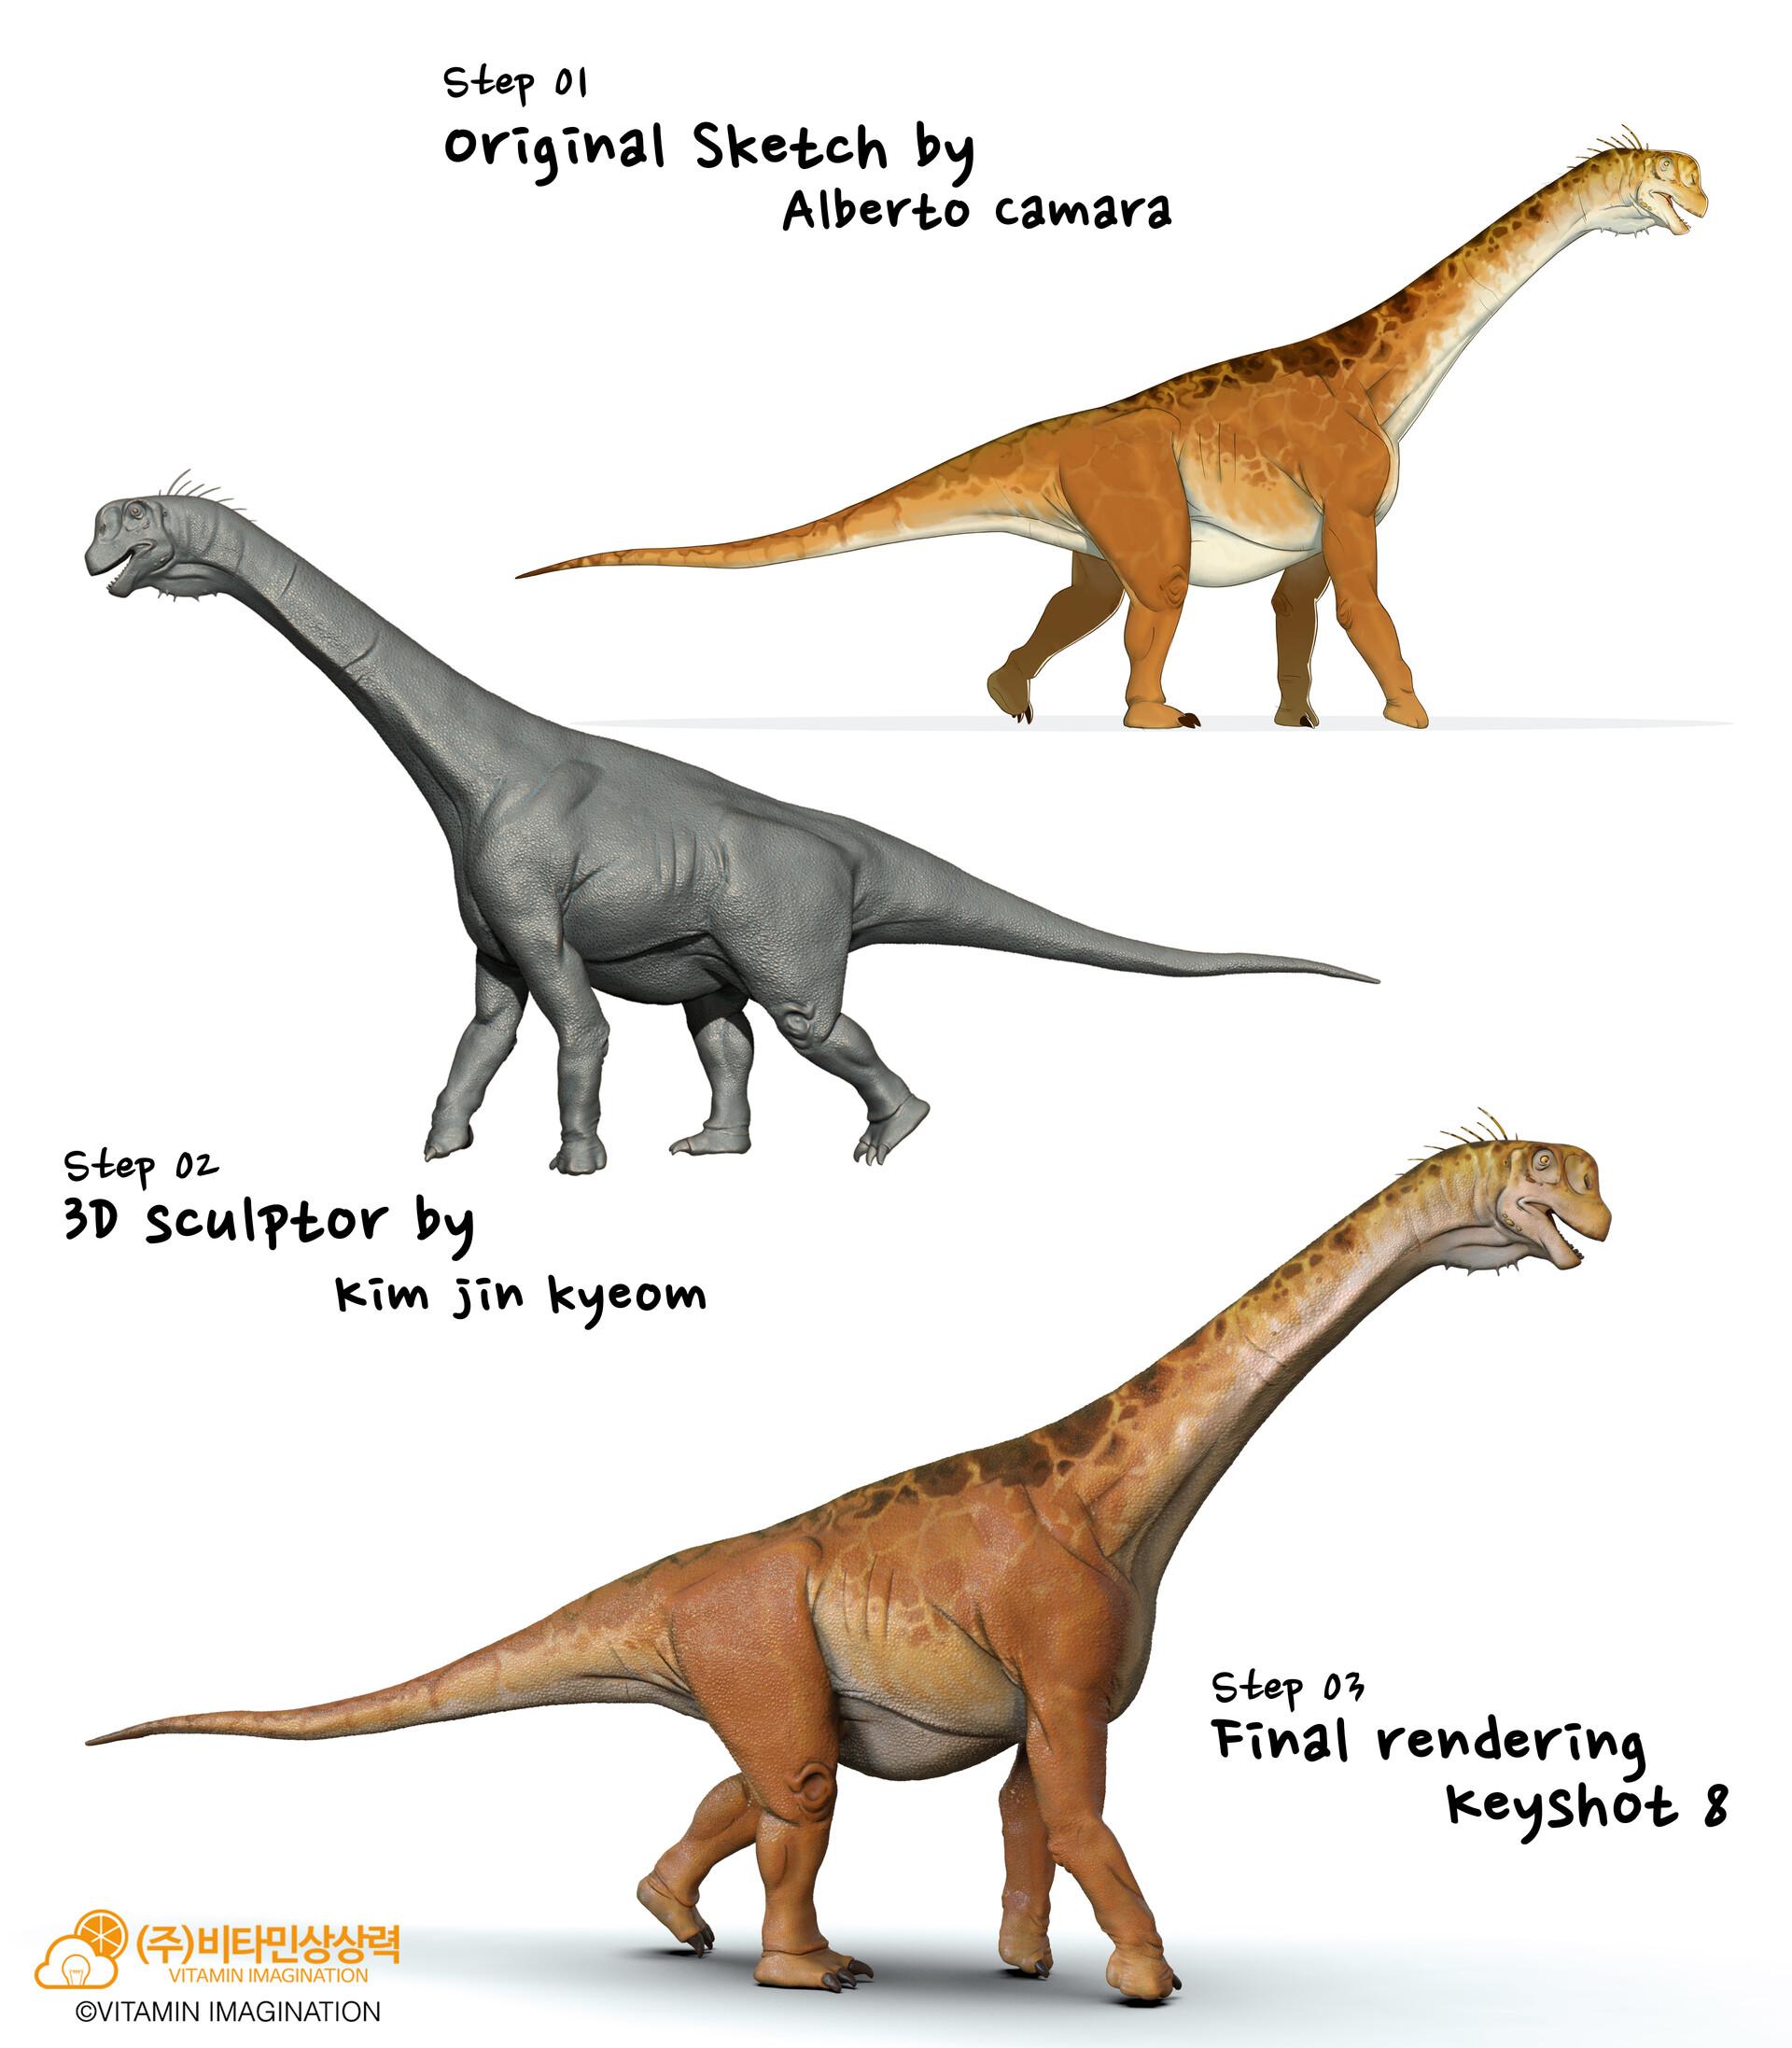 Vitamin imagination camarasaurus 2